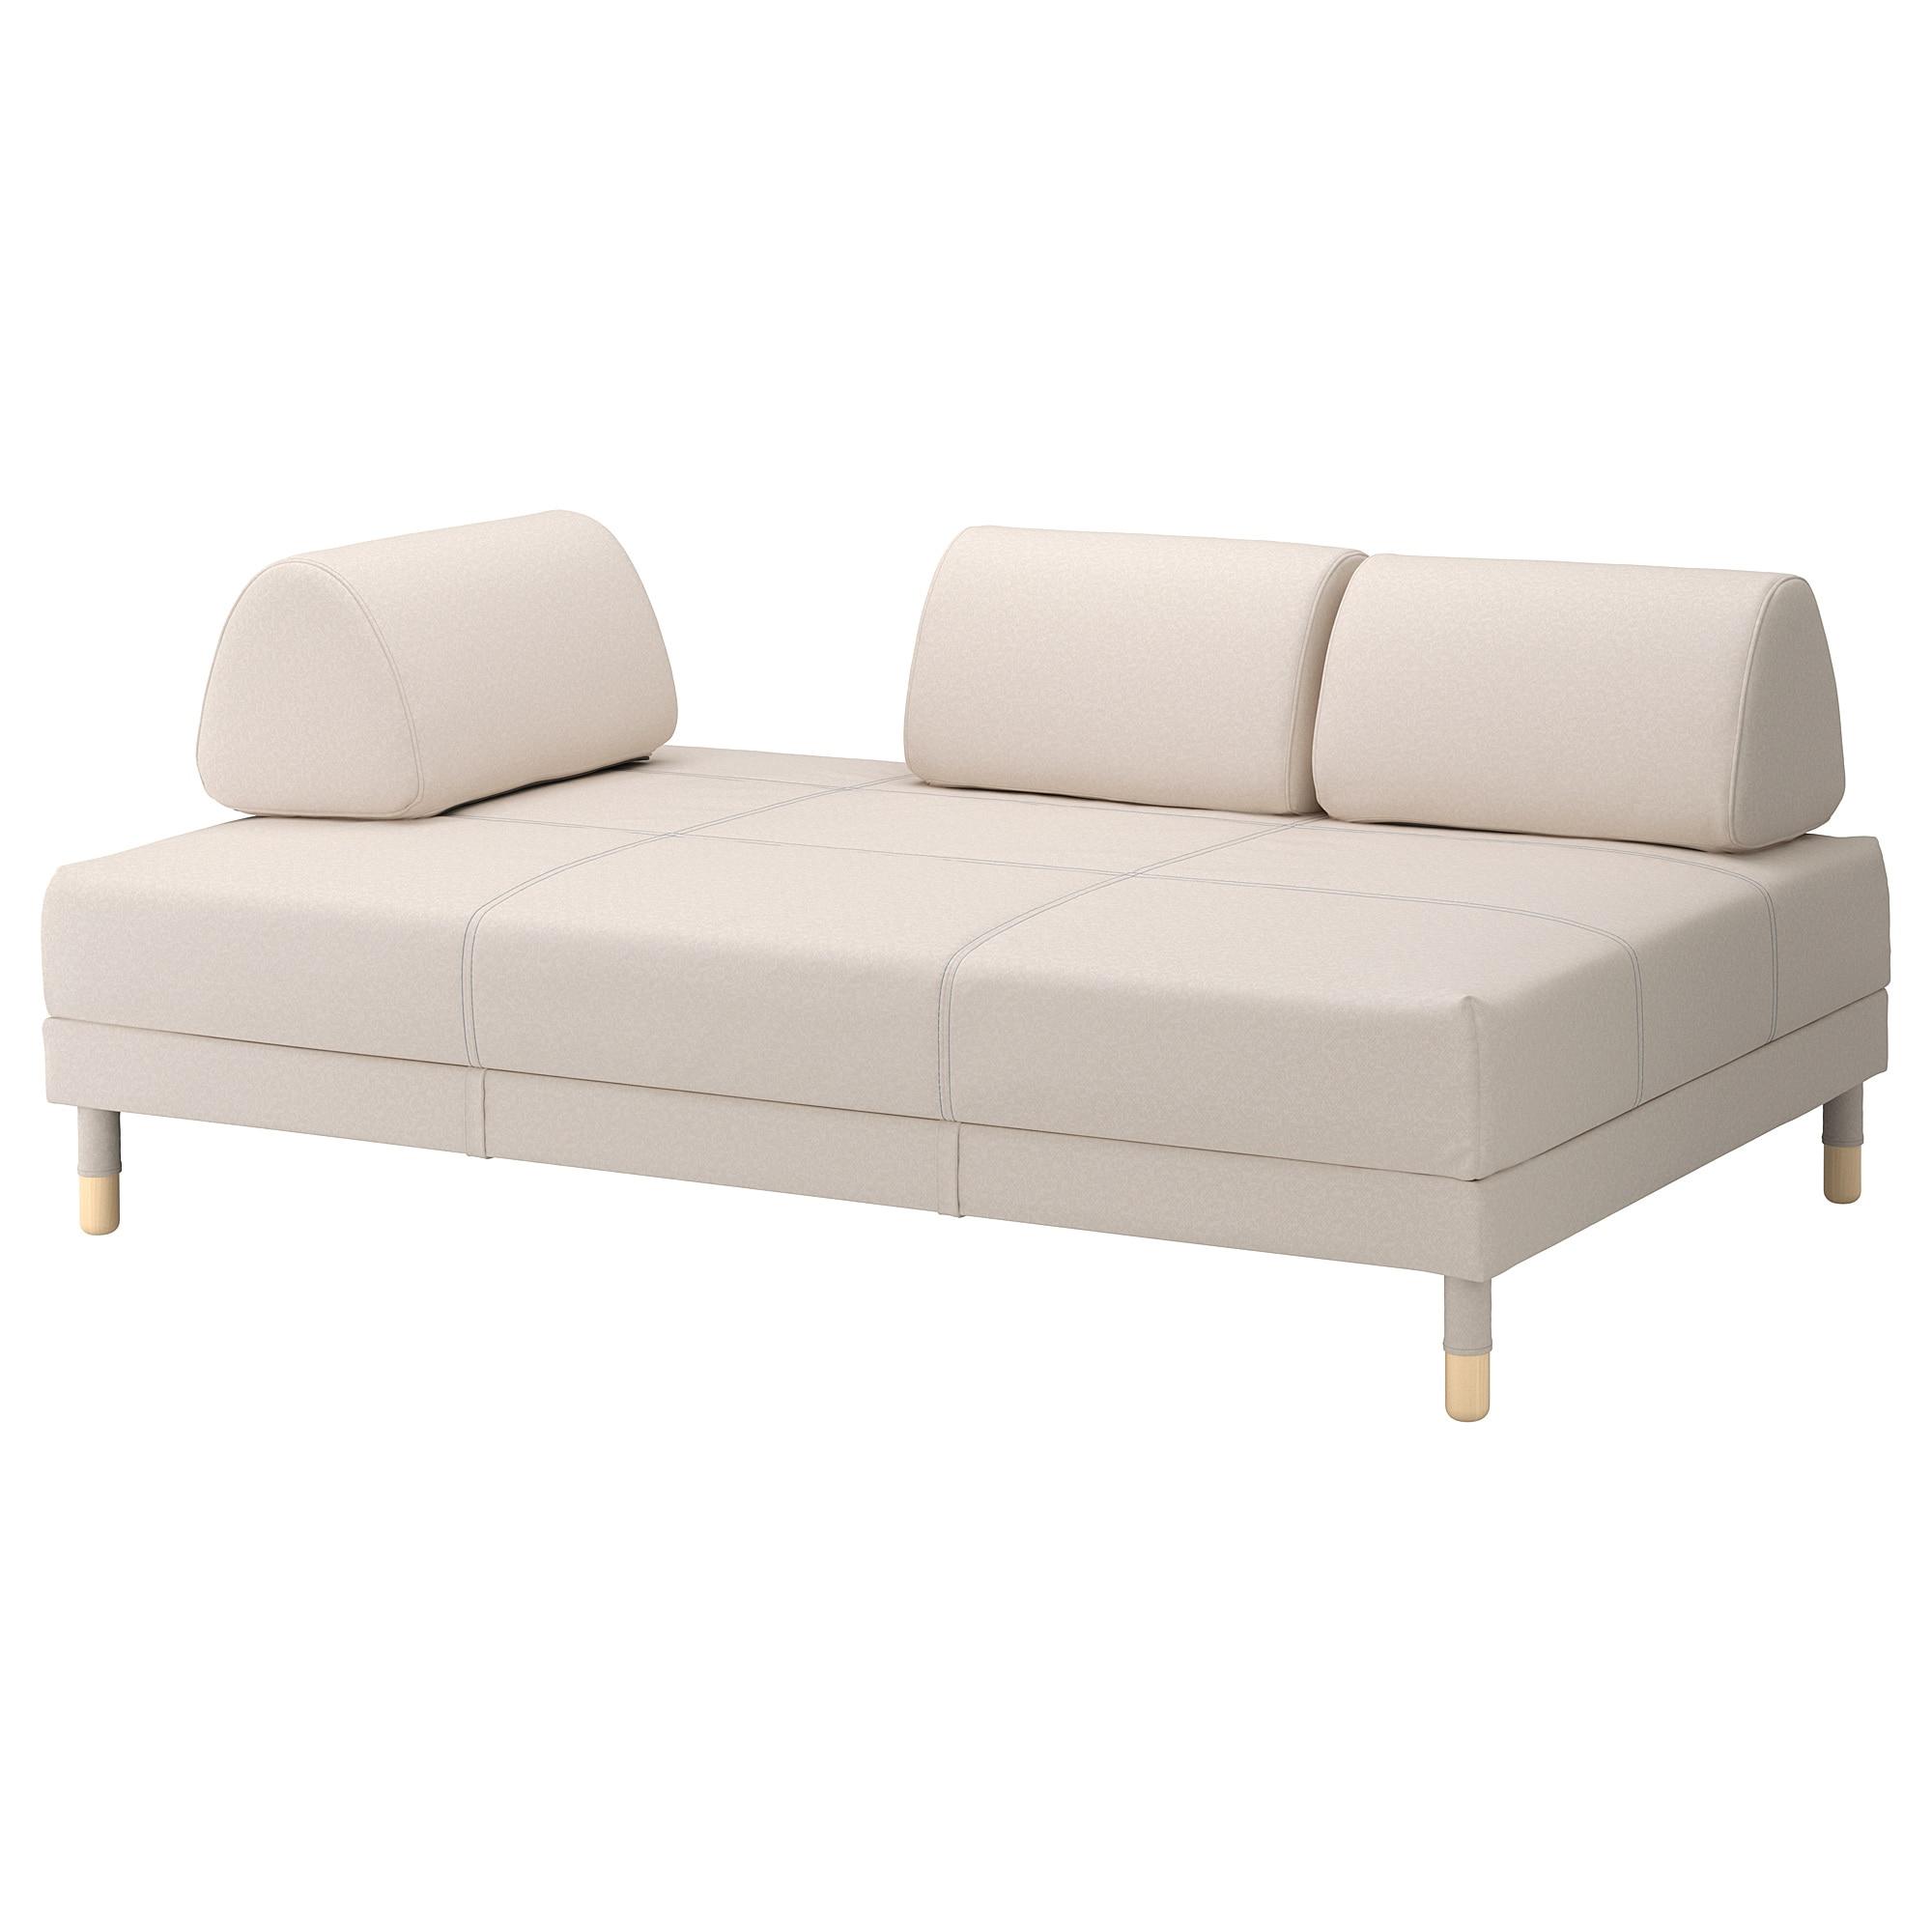 Canapé Convertible Pas Cher Ikea Fauteuils Canaps